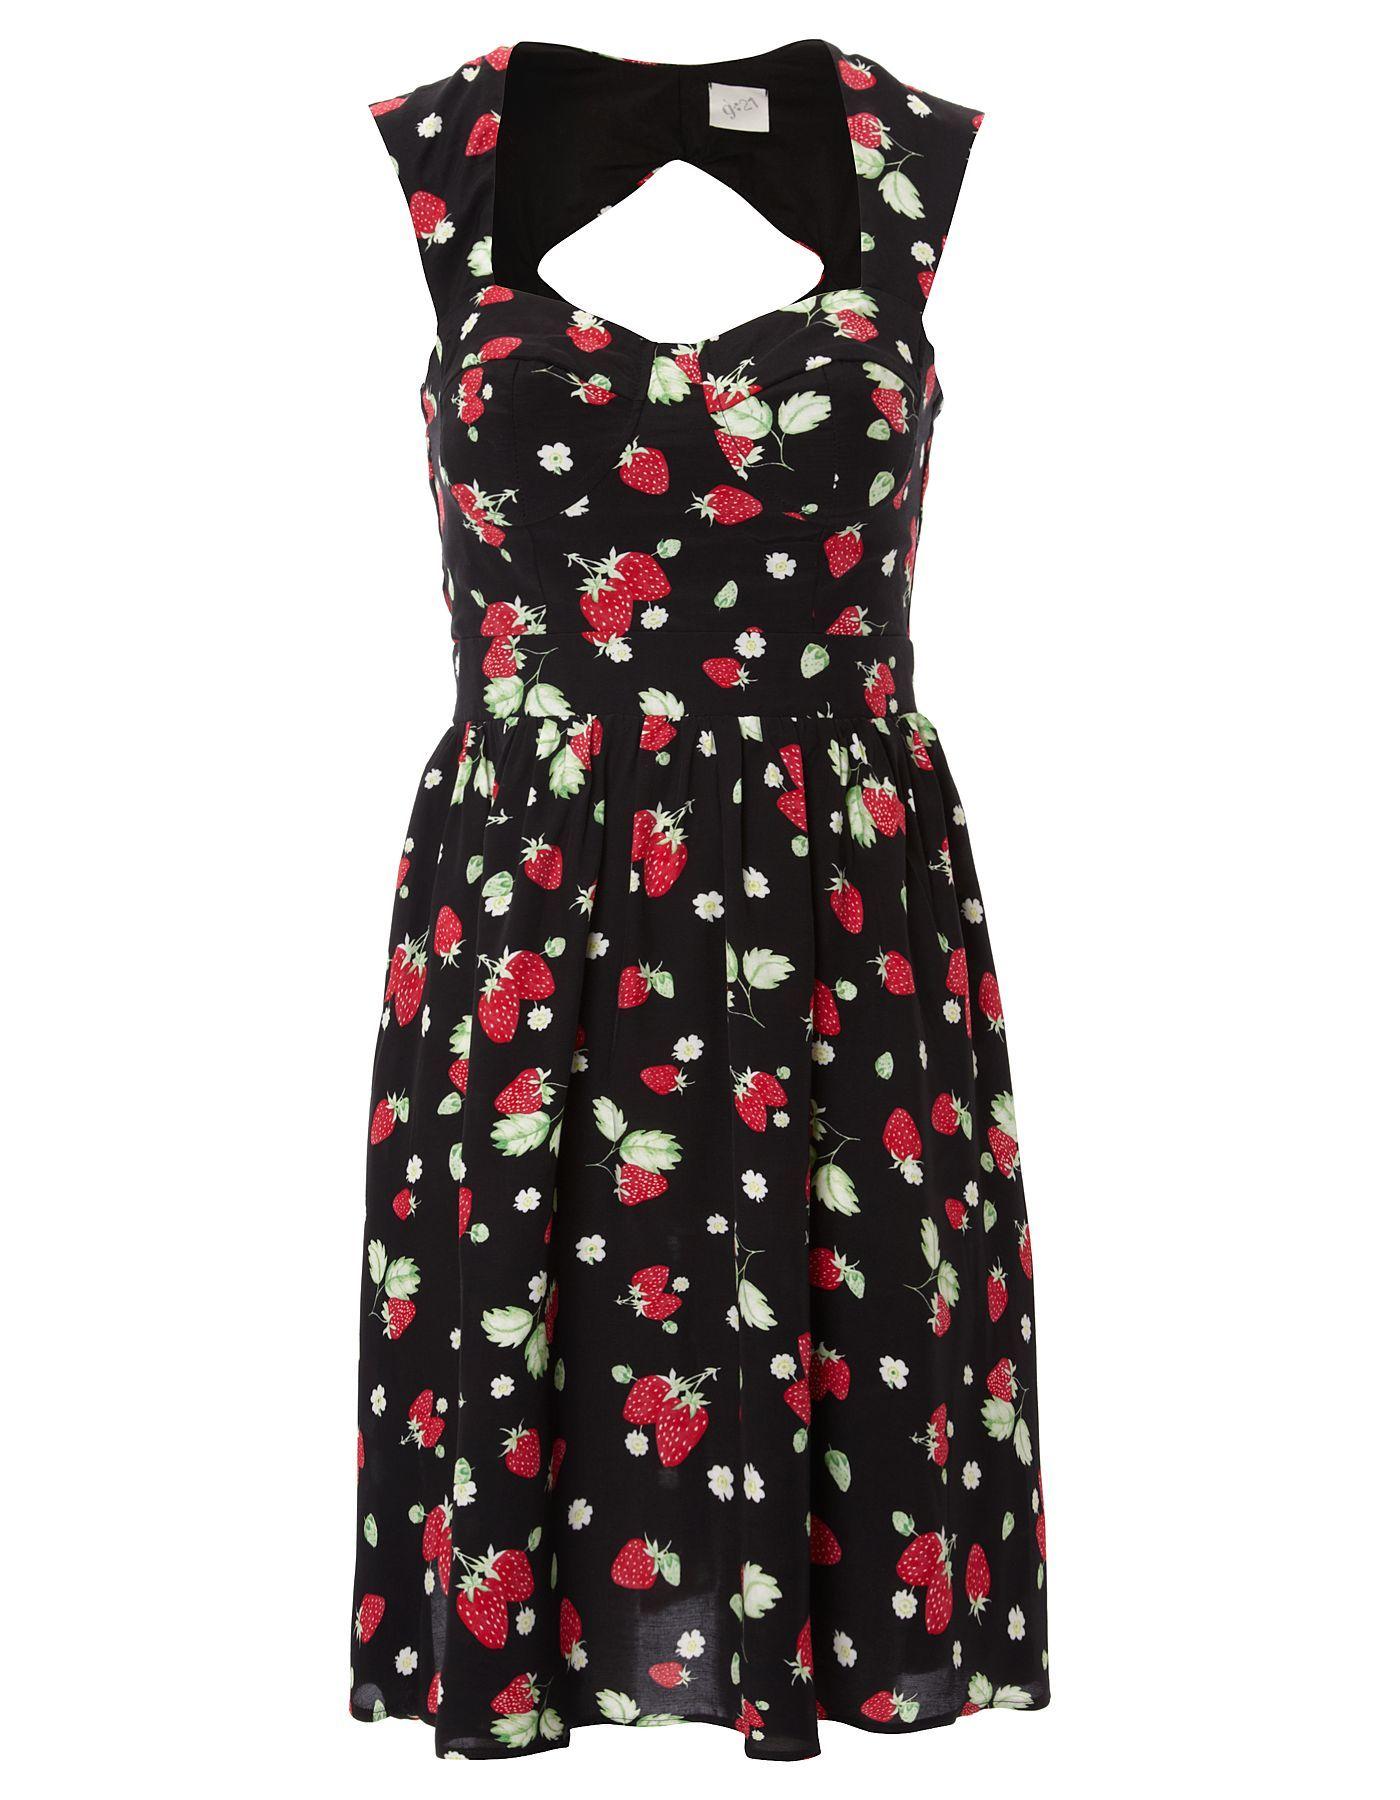 Black sandals asda - G21 Strawberry Dress Women George At Asda